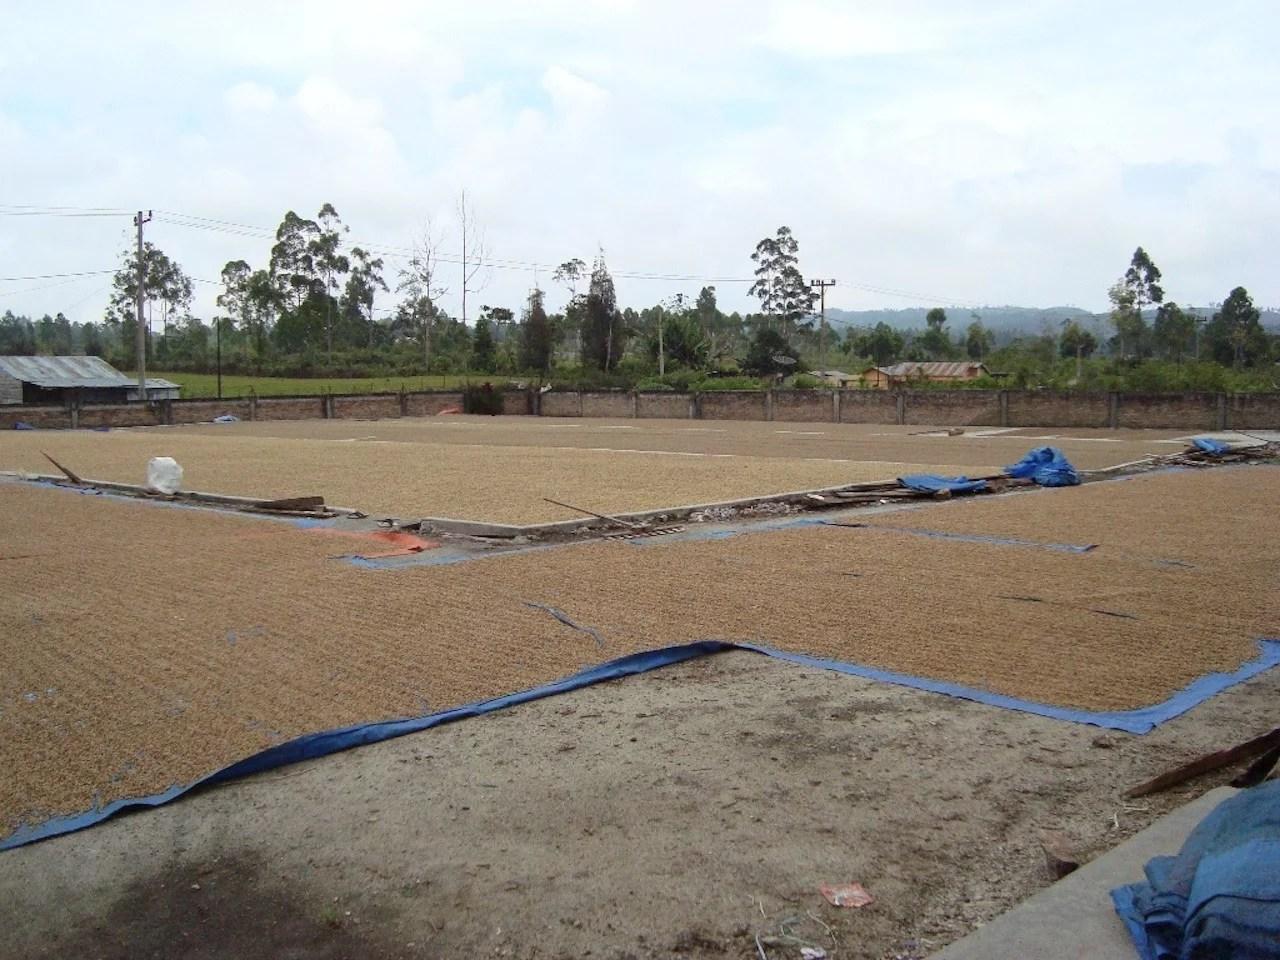 Anbassa artisan torrefacteur café sumatra shere khan plantation